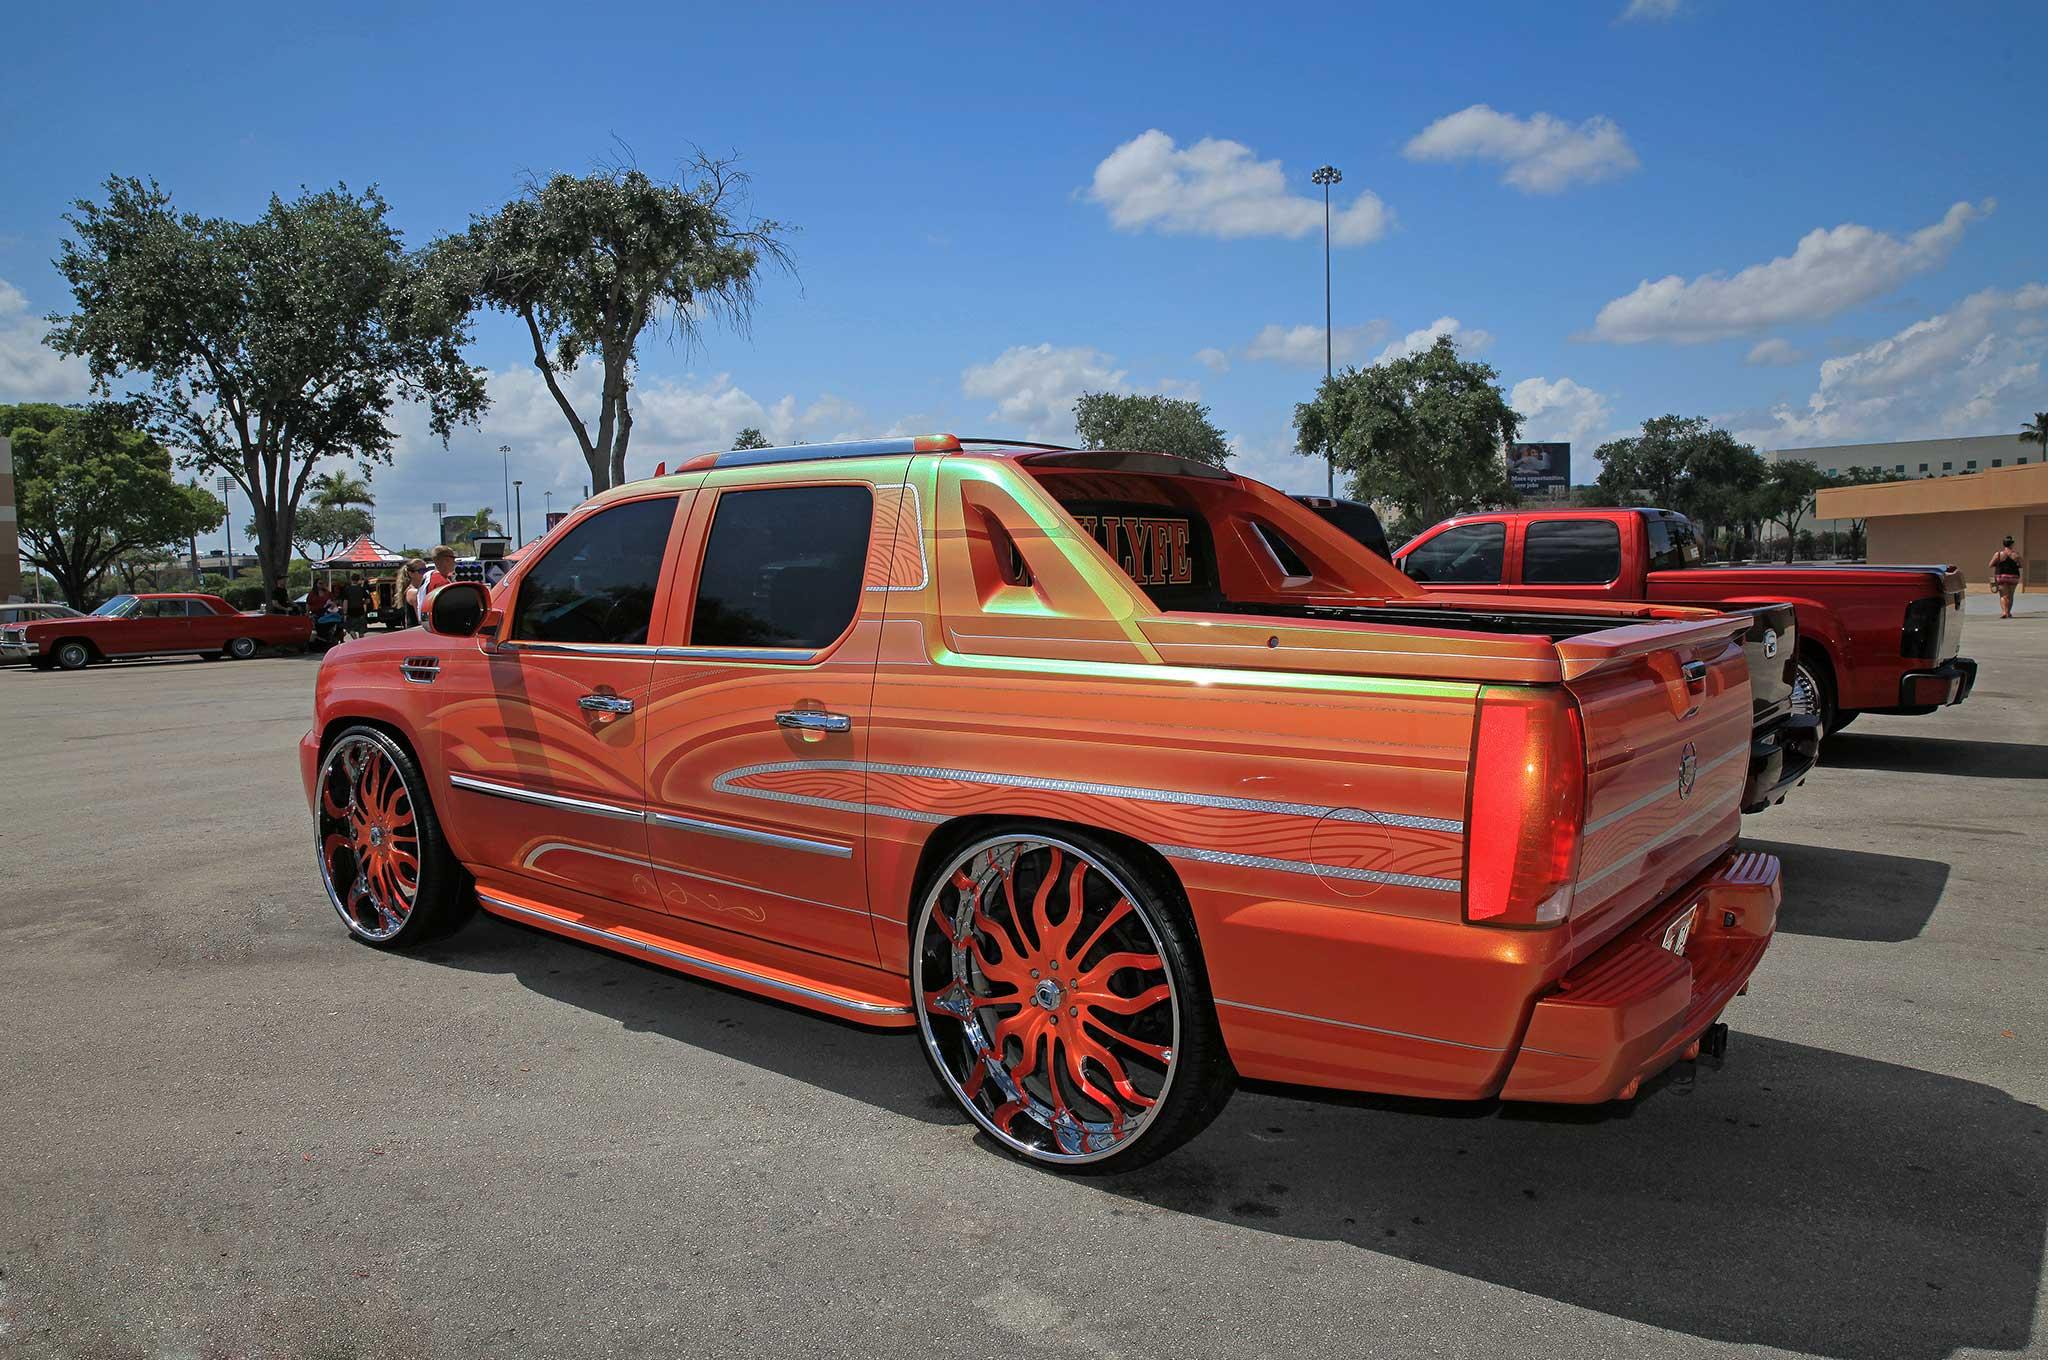 Cadillac Escalade Ext Miami Super Show Truck Lowrider - Cadillac dealer miami